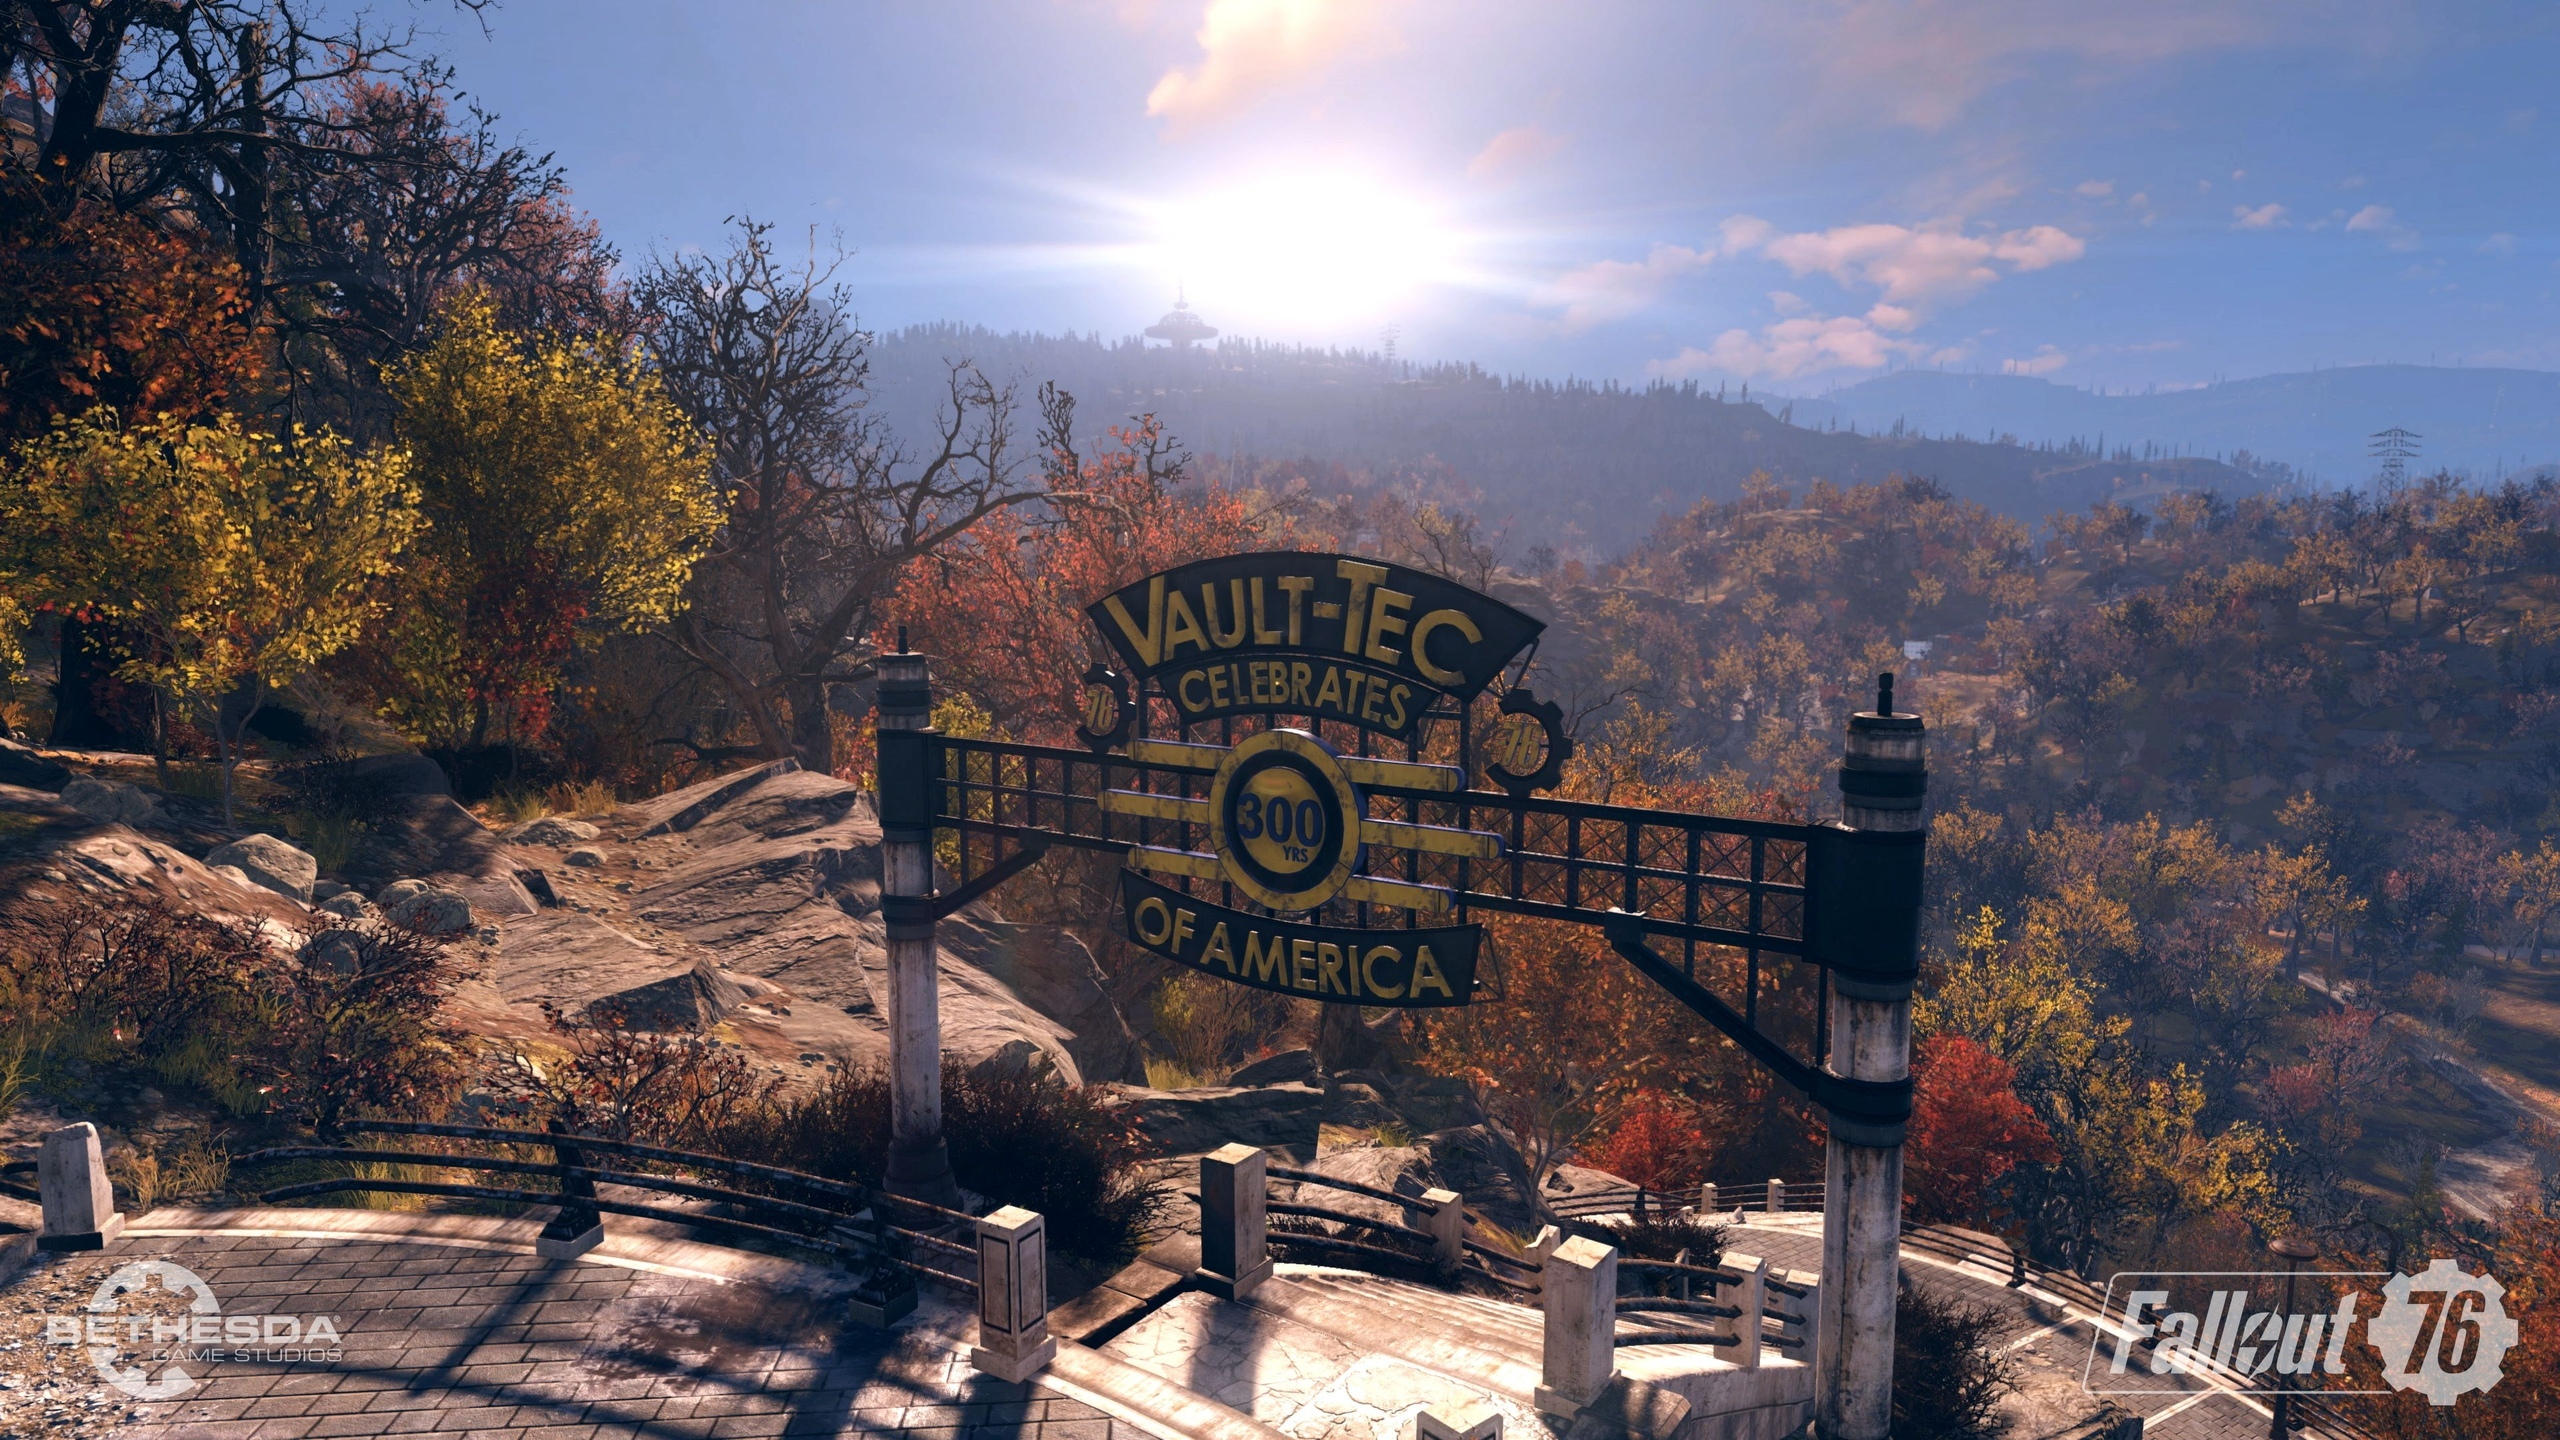 PC-версия Fallout76 и в бете, и на запуске будет доступна исключительно через Bethesda.